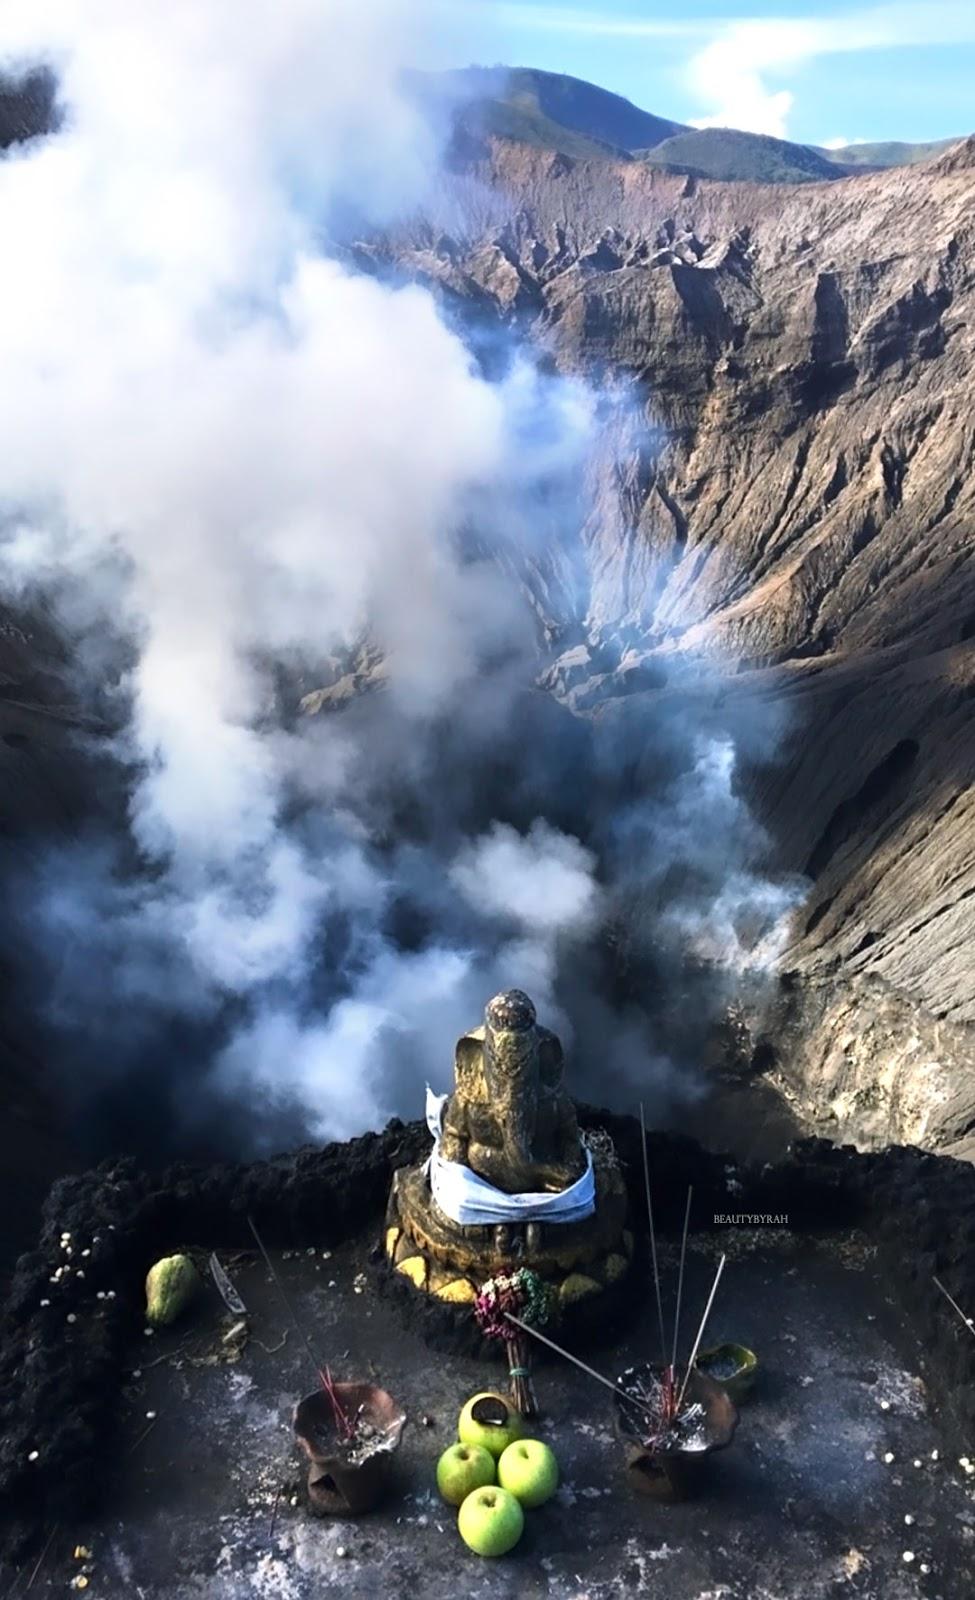 Mount Bromo and Surabaya Indonesia Travel Guide